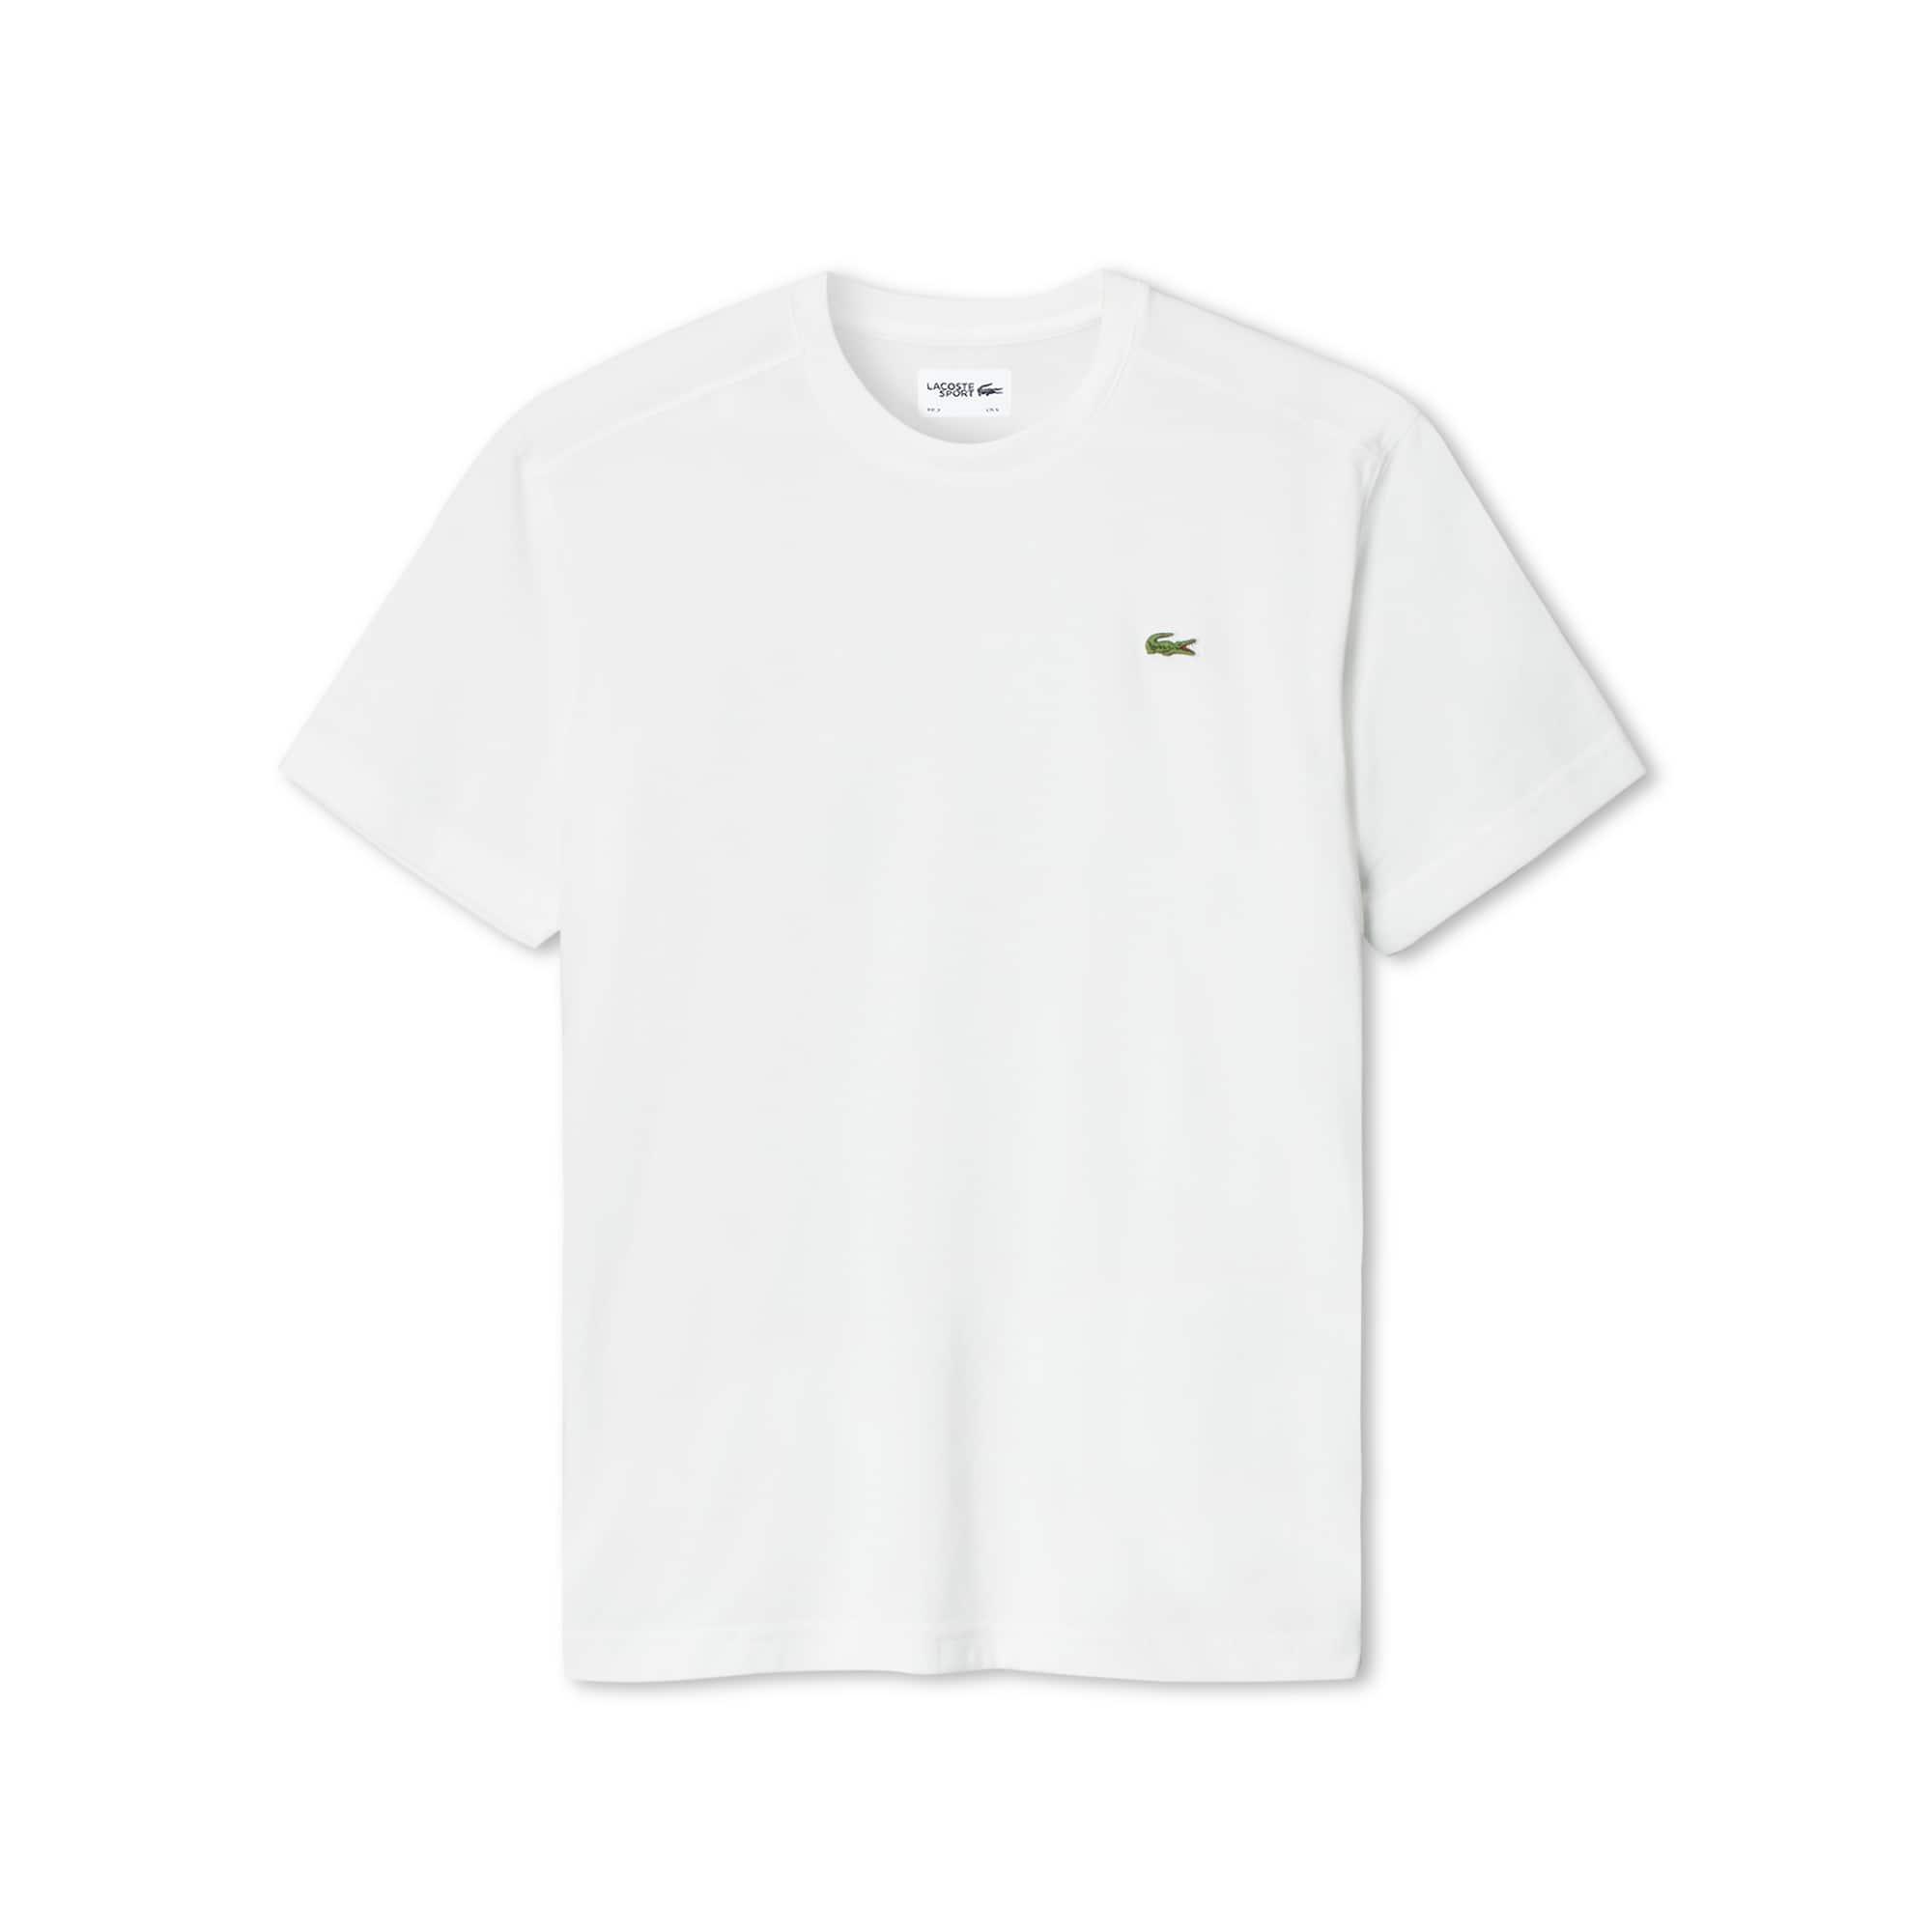 Lacoste SPORT系列男士圆领科技棉网球T恤